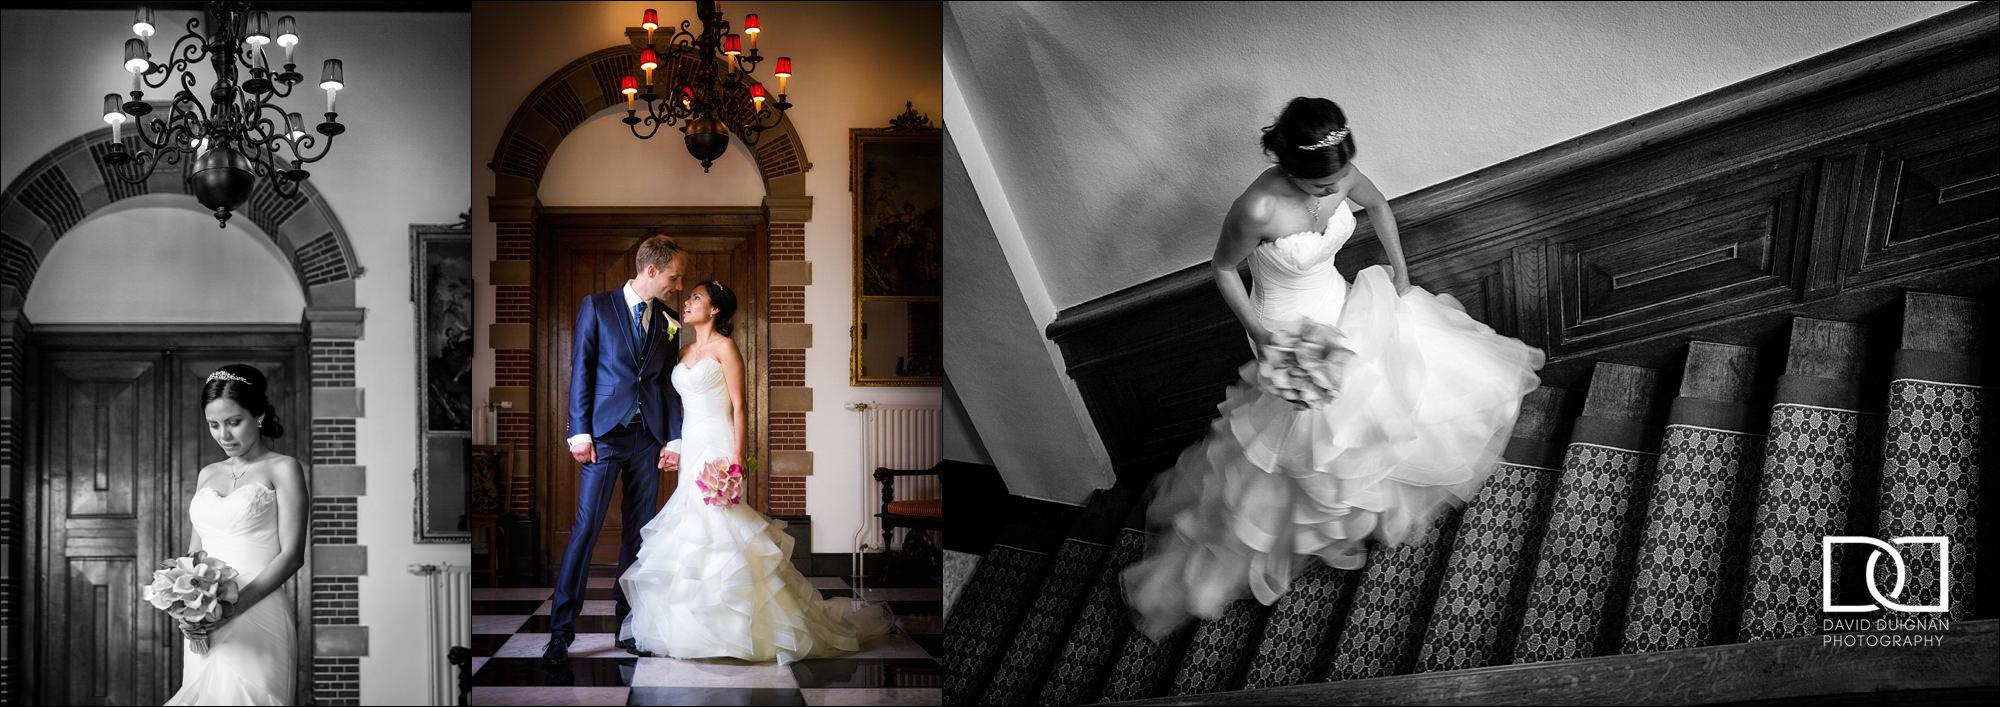 dublin wedding photographer david duignan photography wedding photos 0038